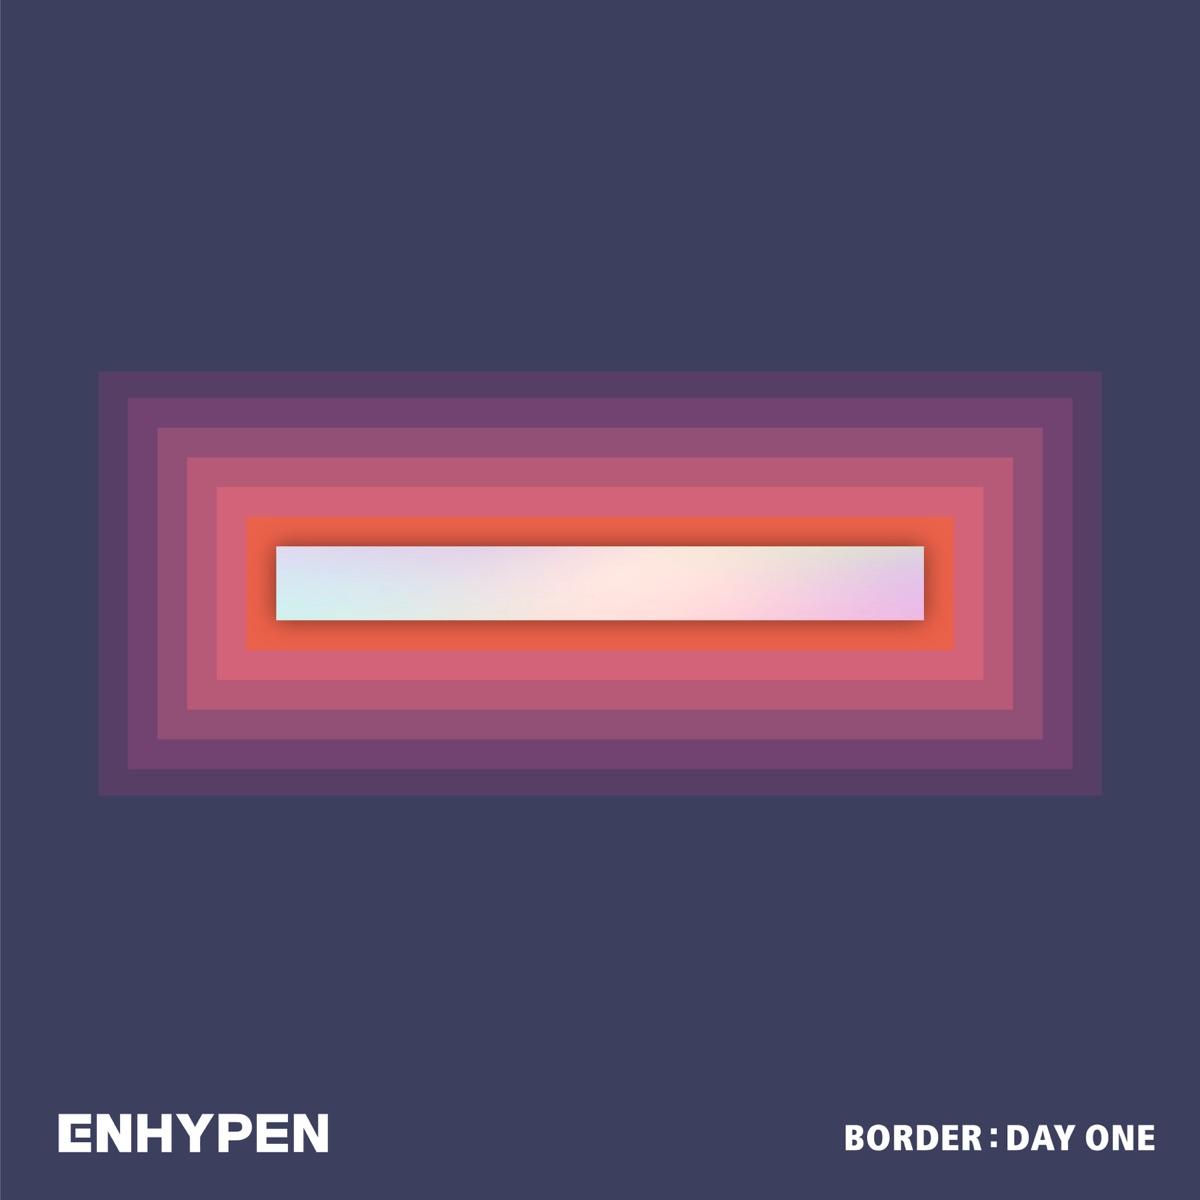 『ENHYPEN - Given-Taken 歌詞』収録の『BORDER : DAY ONE』ジャケット